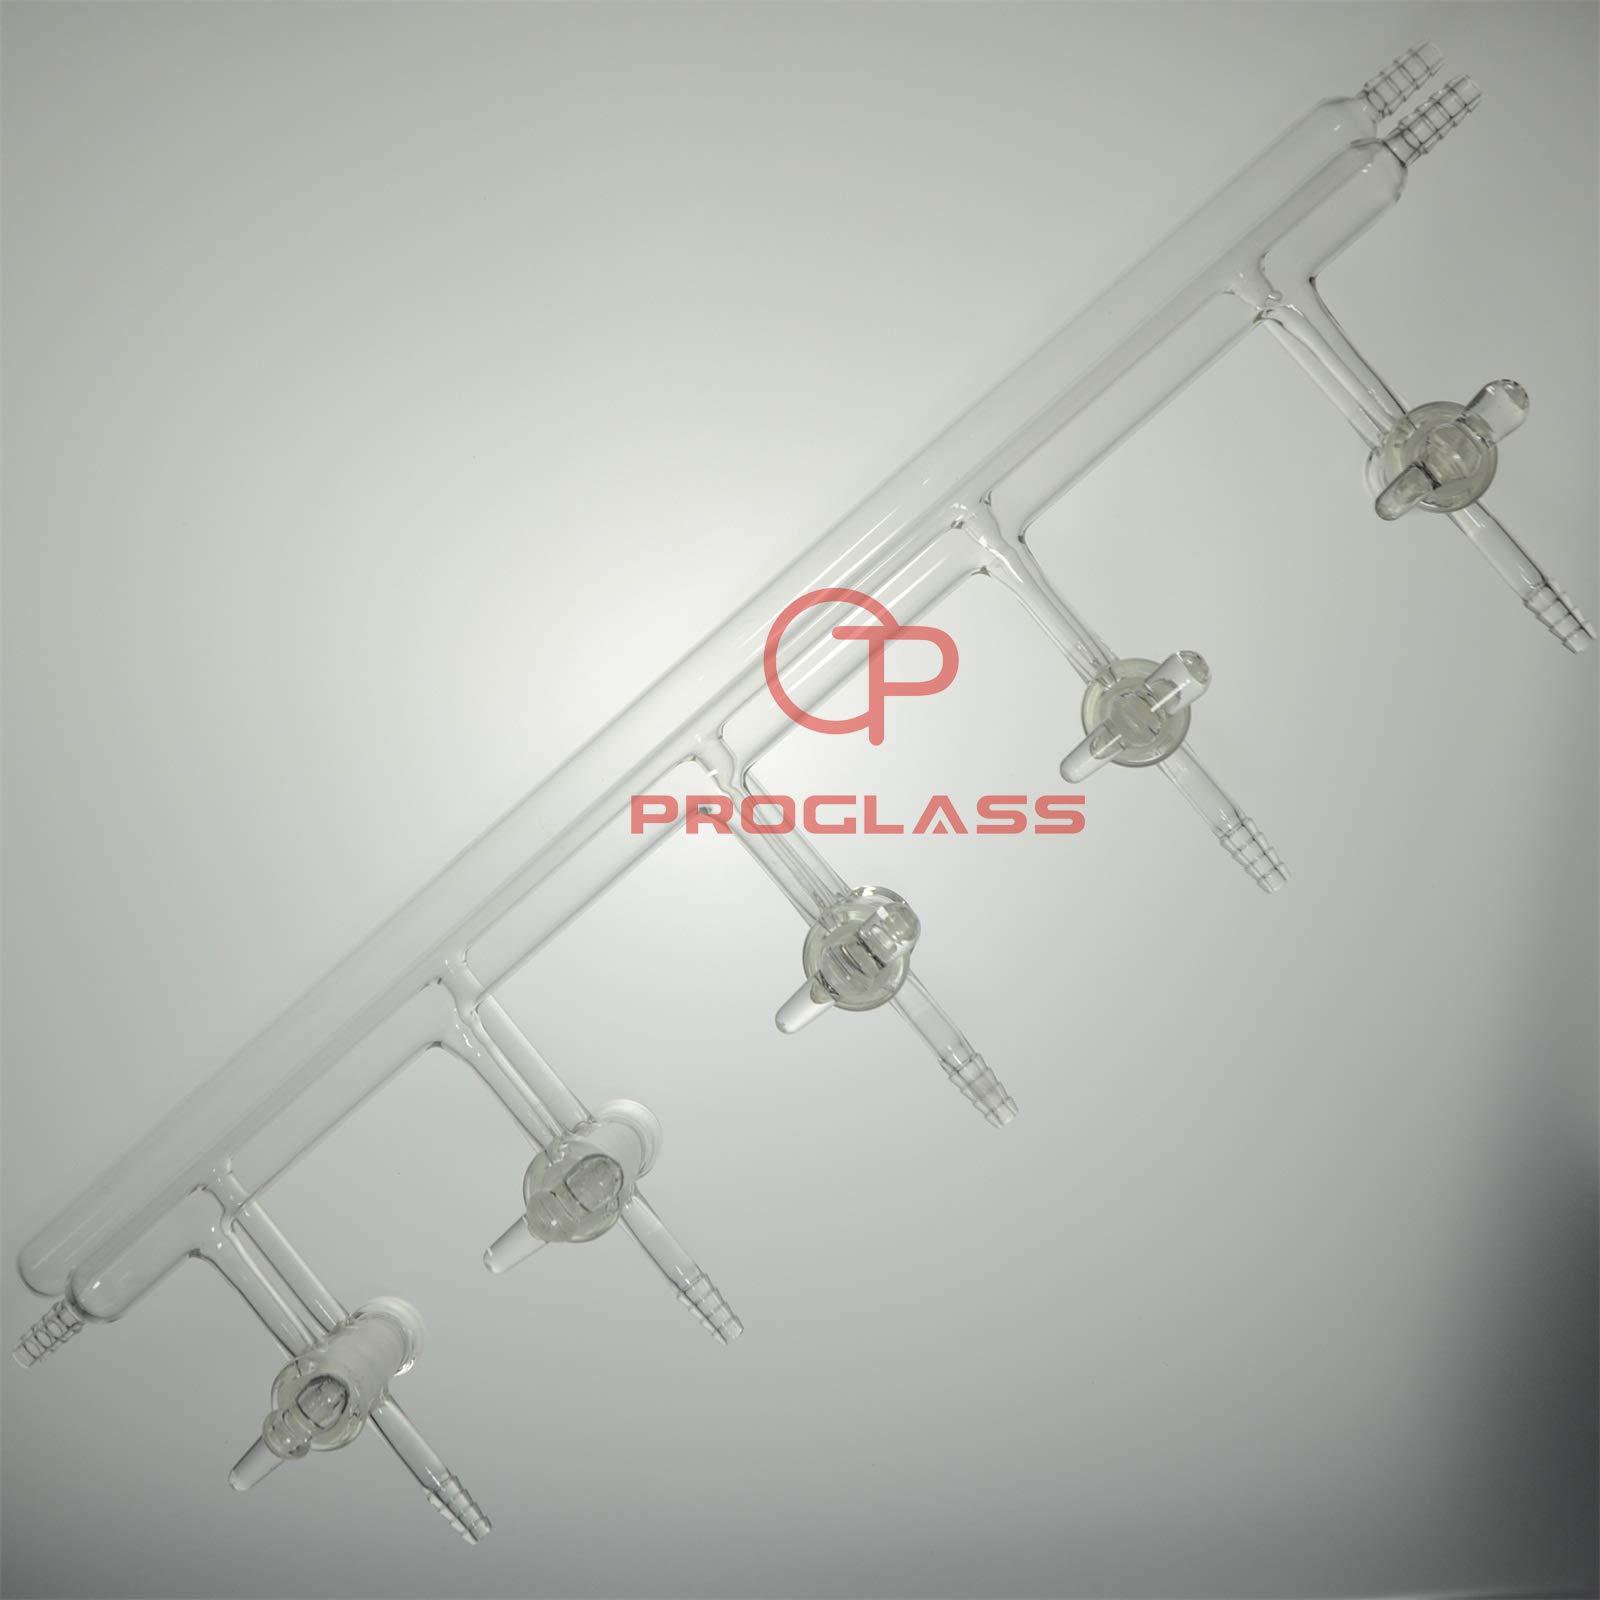 Proglass Manifold,Vacuum/Inert Gas,high Vacuum Hollow Glass stopcocks by PROGLASS